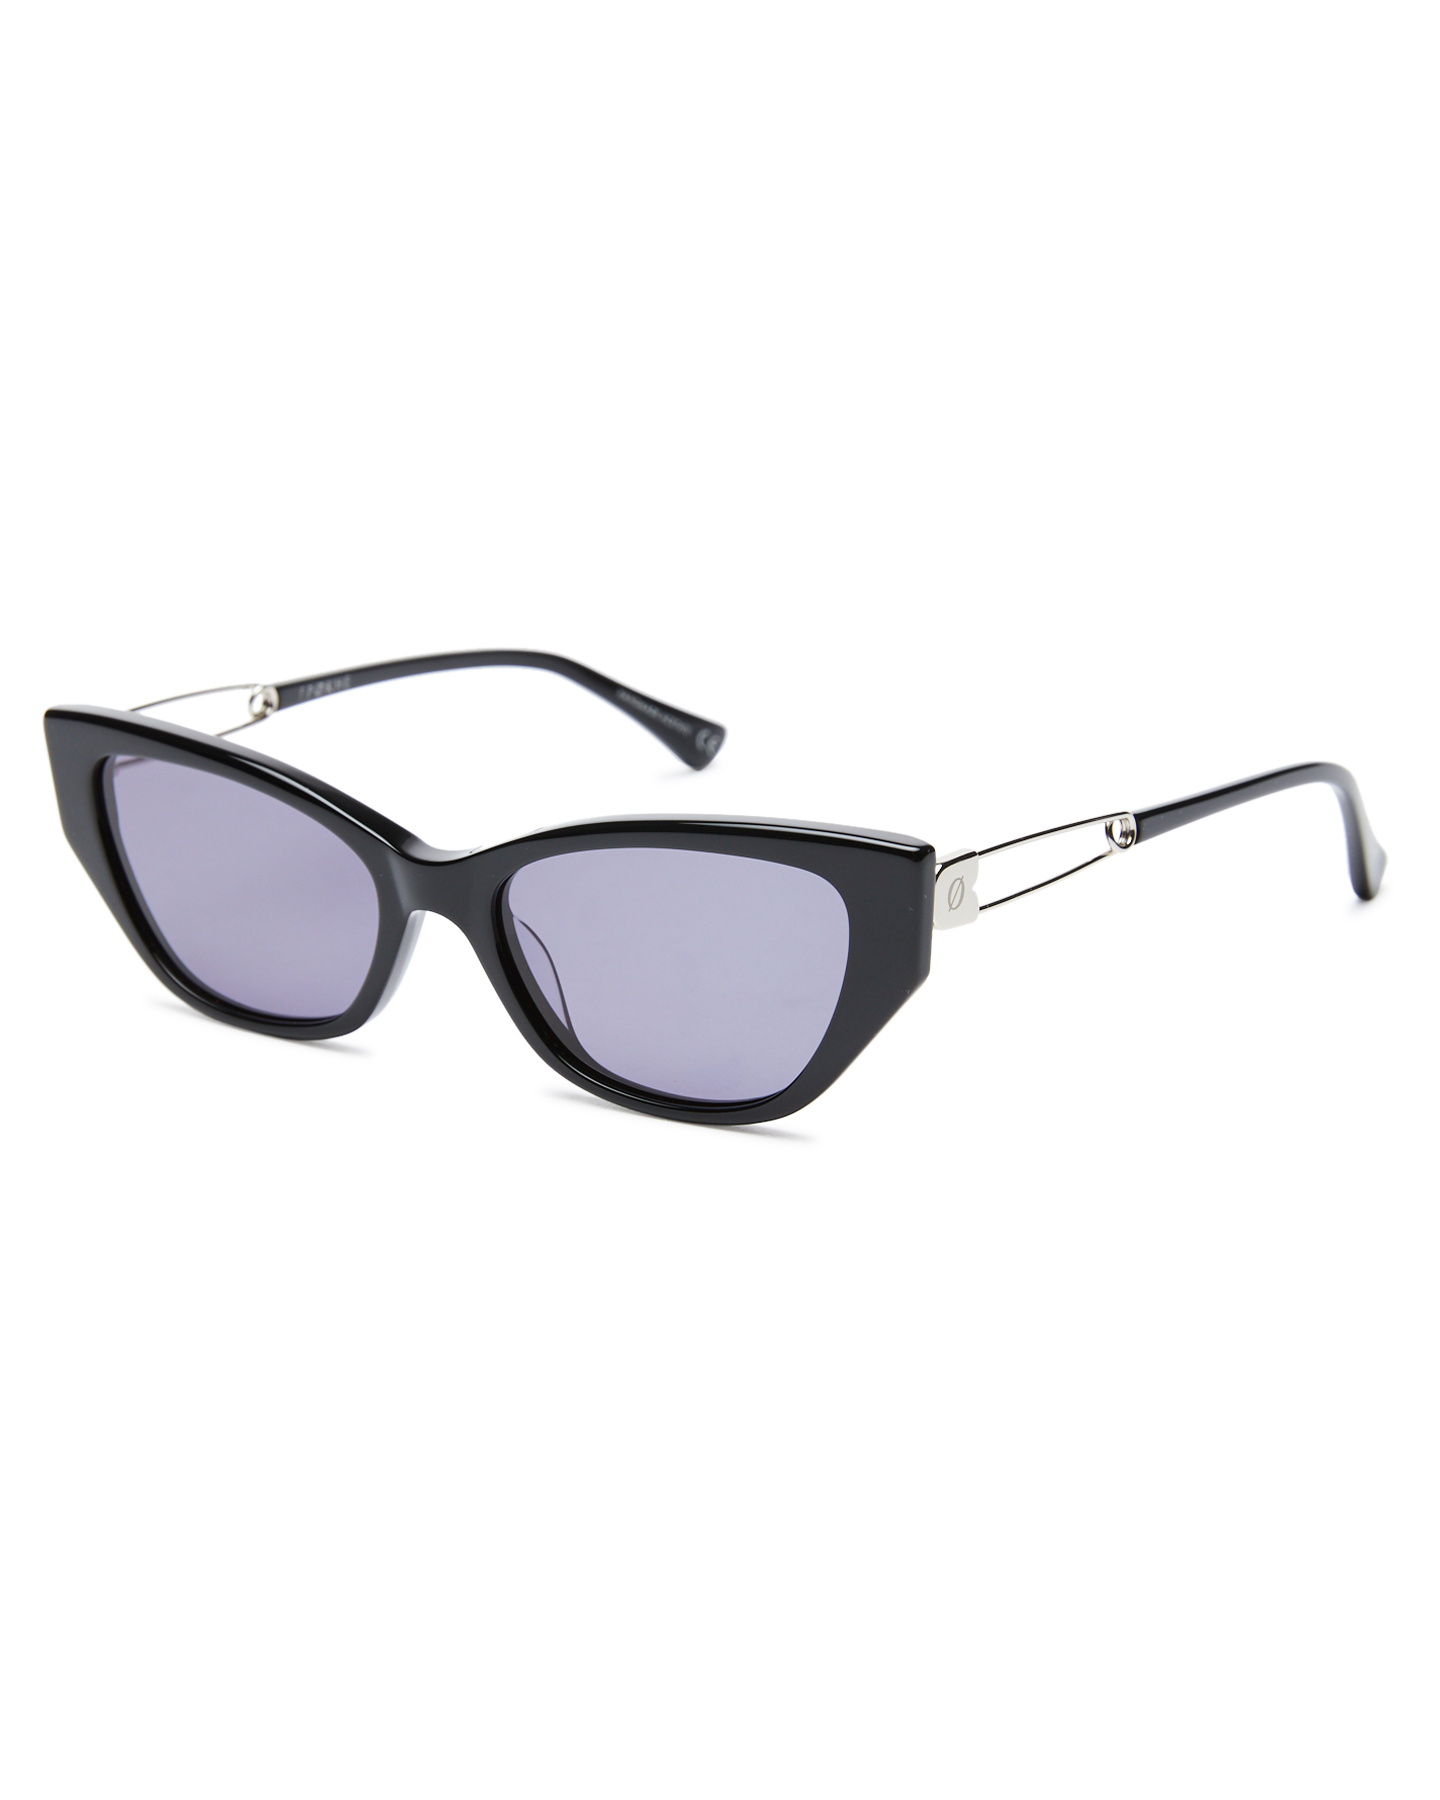 Epokhe Wire Sunglasses Black Polished Black